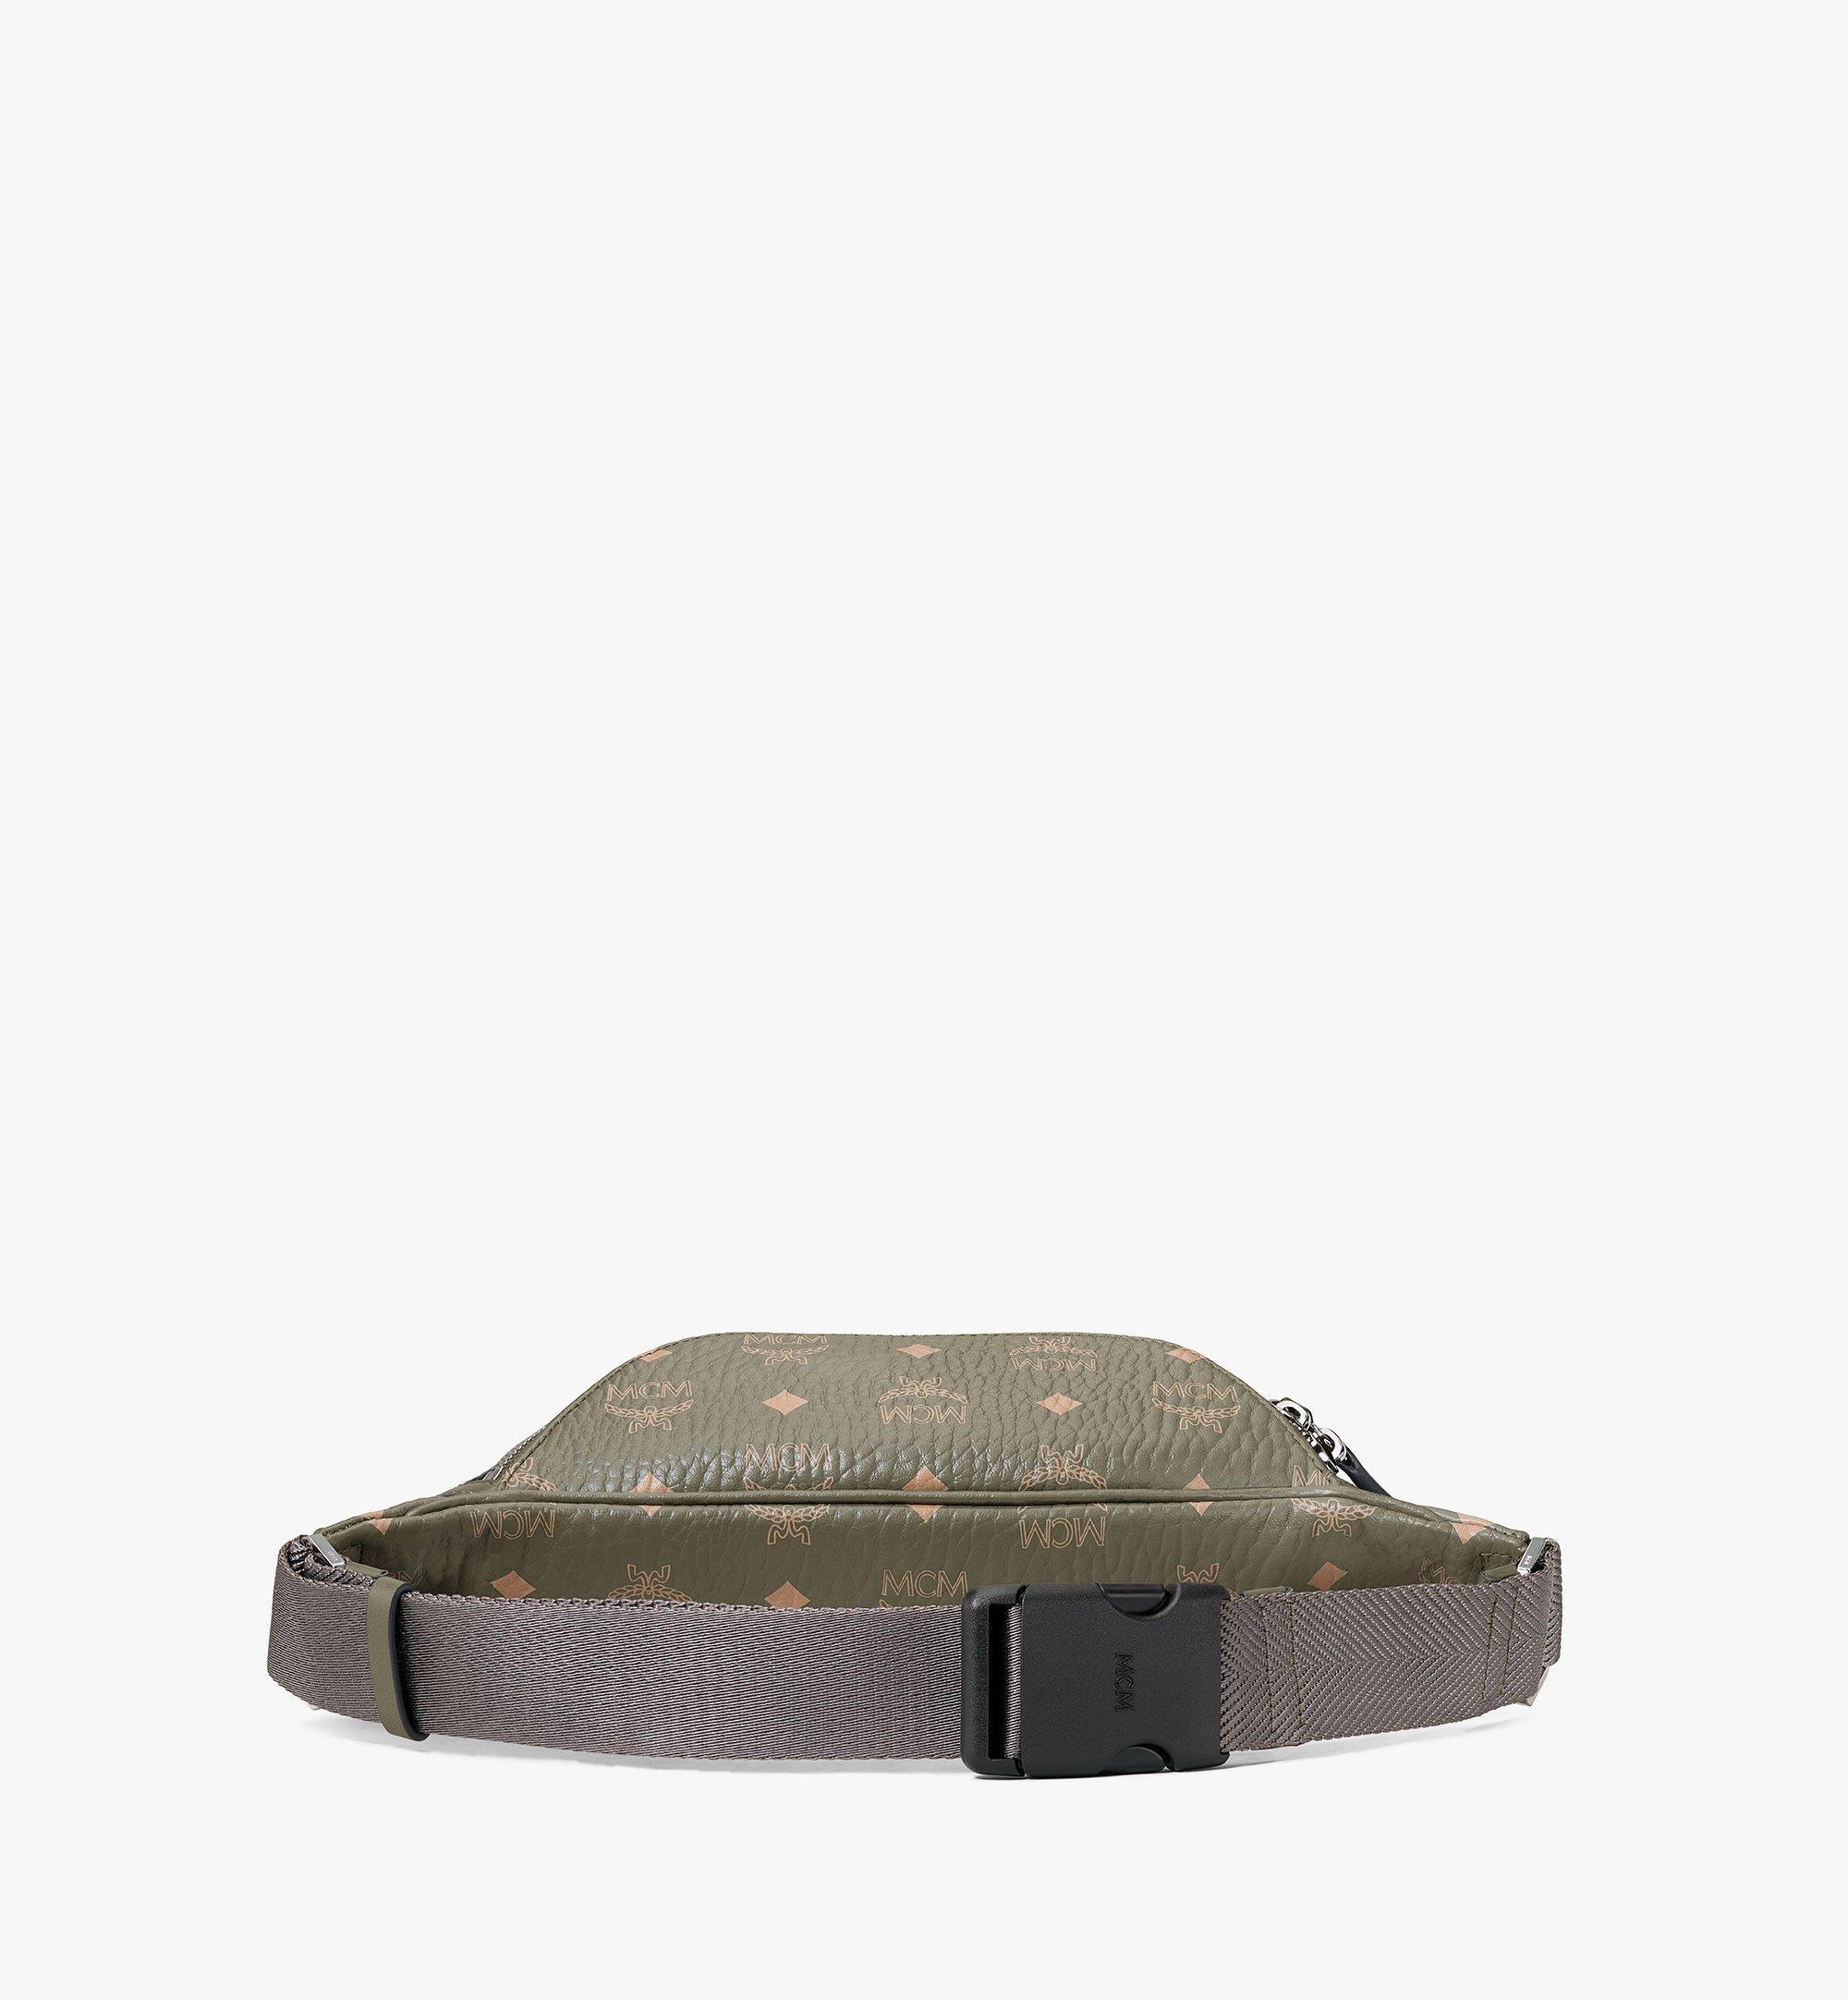 MCM Fursten Belt Bag in Visetos Green MMZAAFI04JH001 Alternate View 3